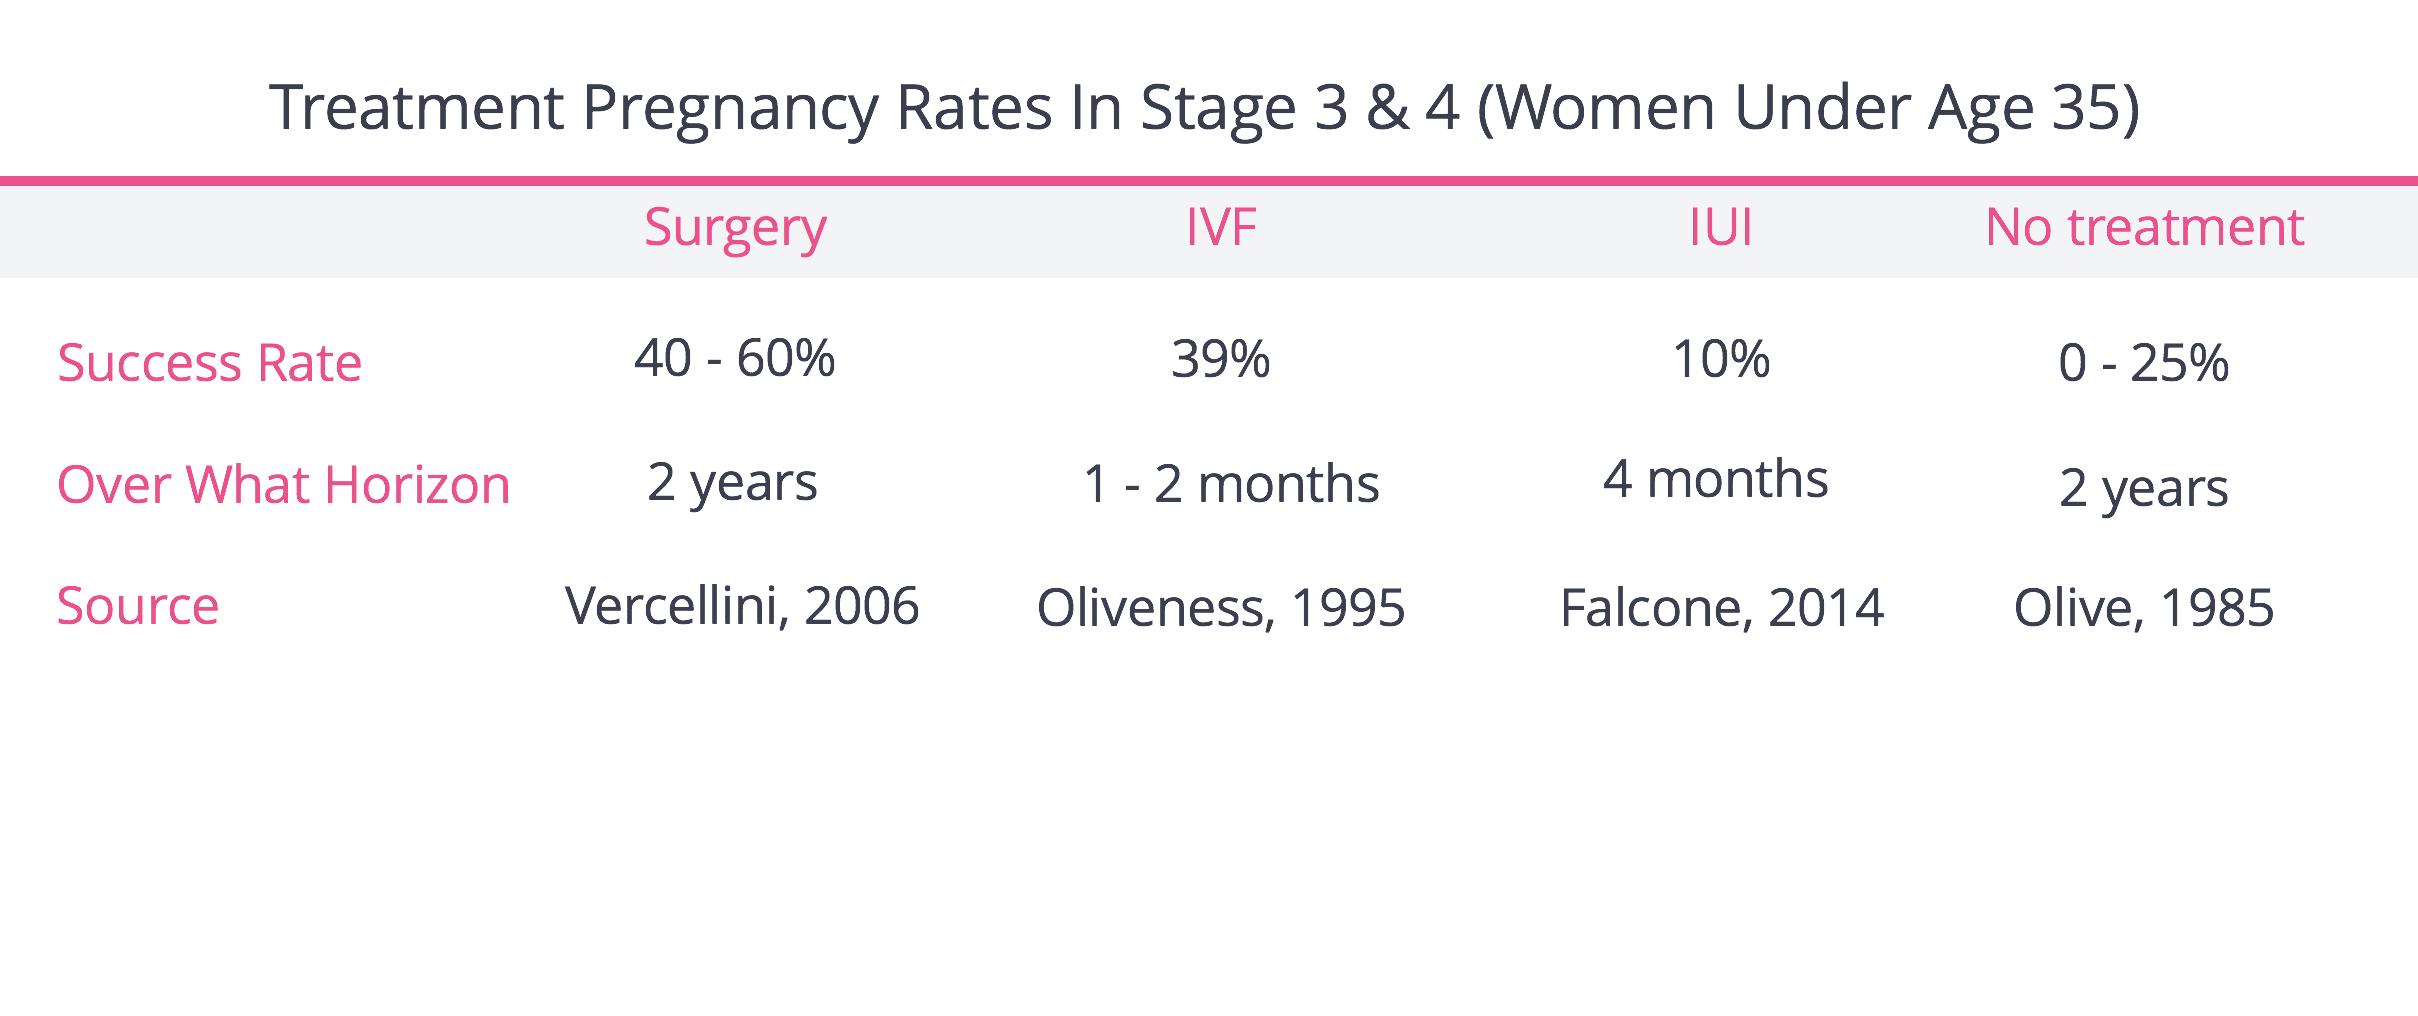 FertilityIQ: Treating Endometriosis